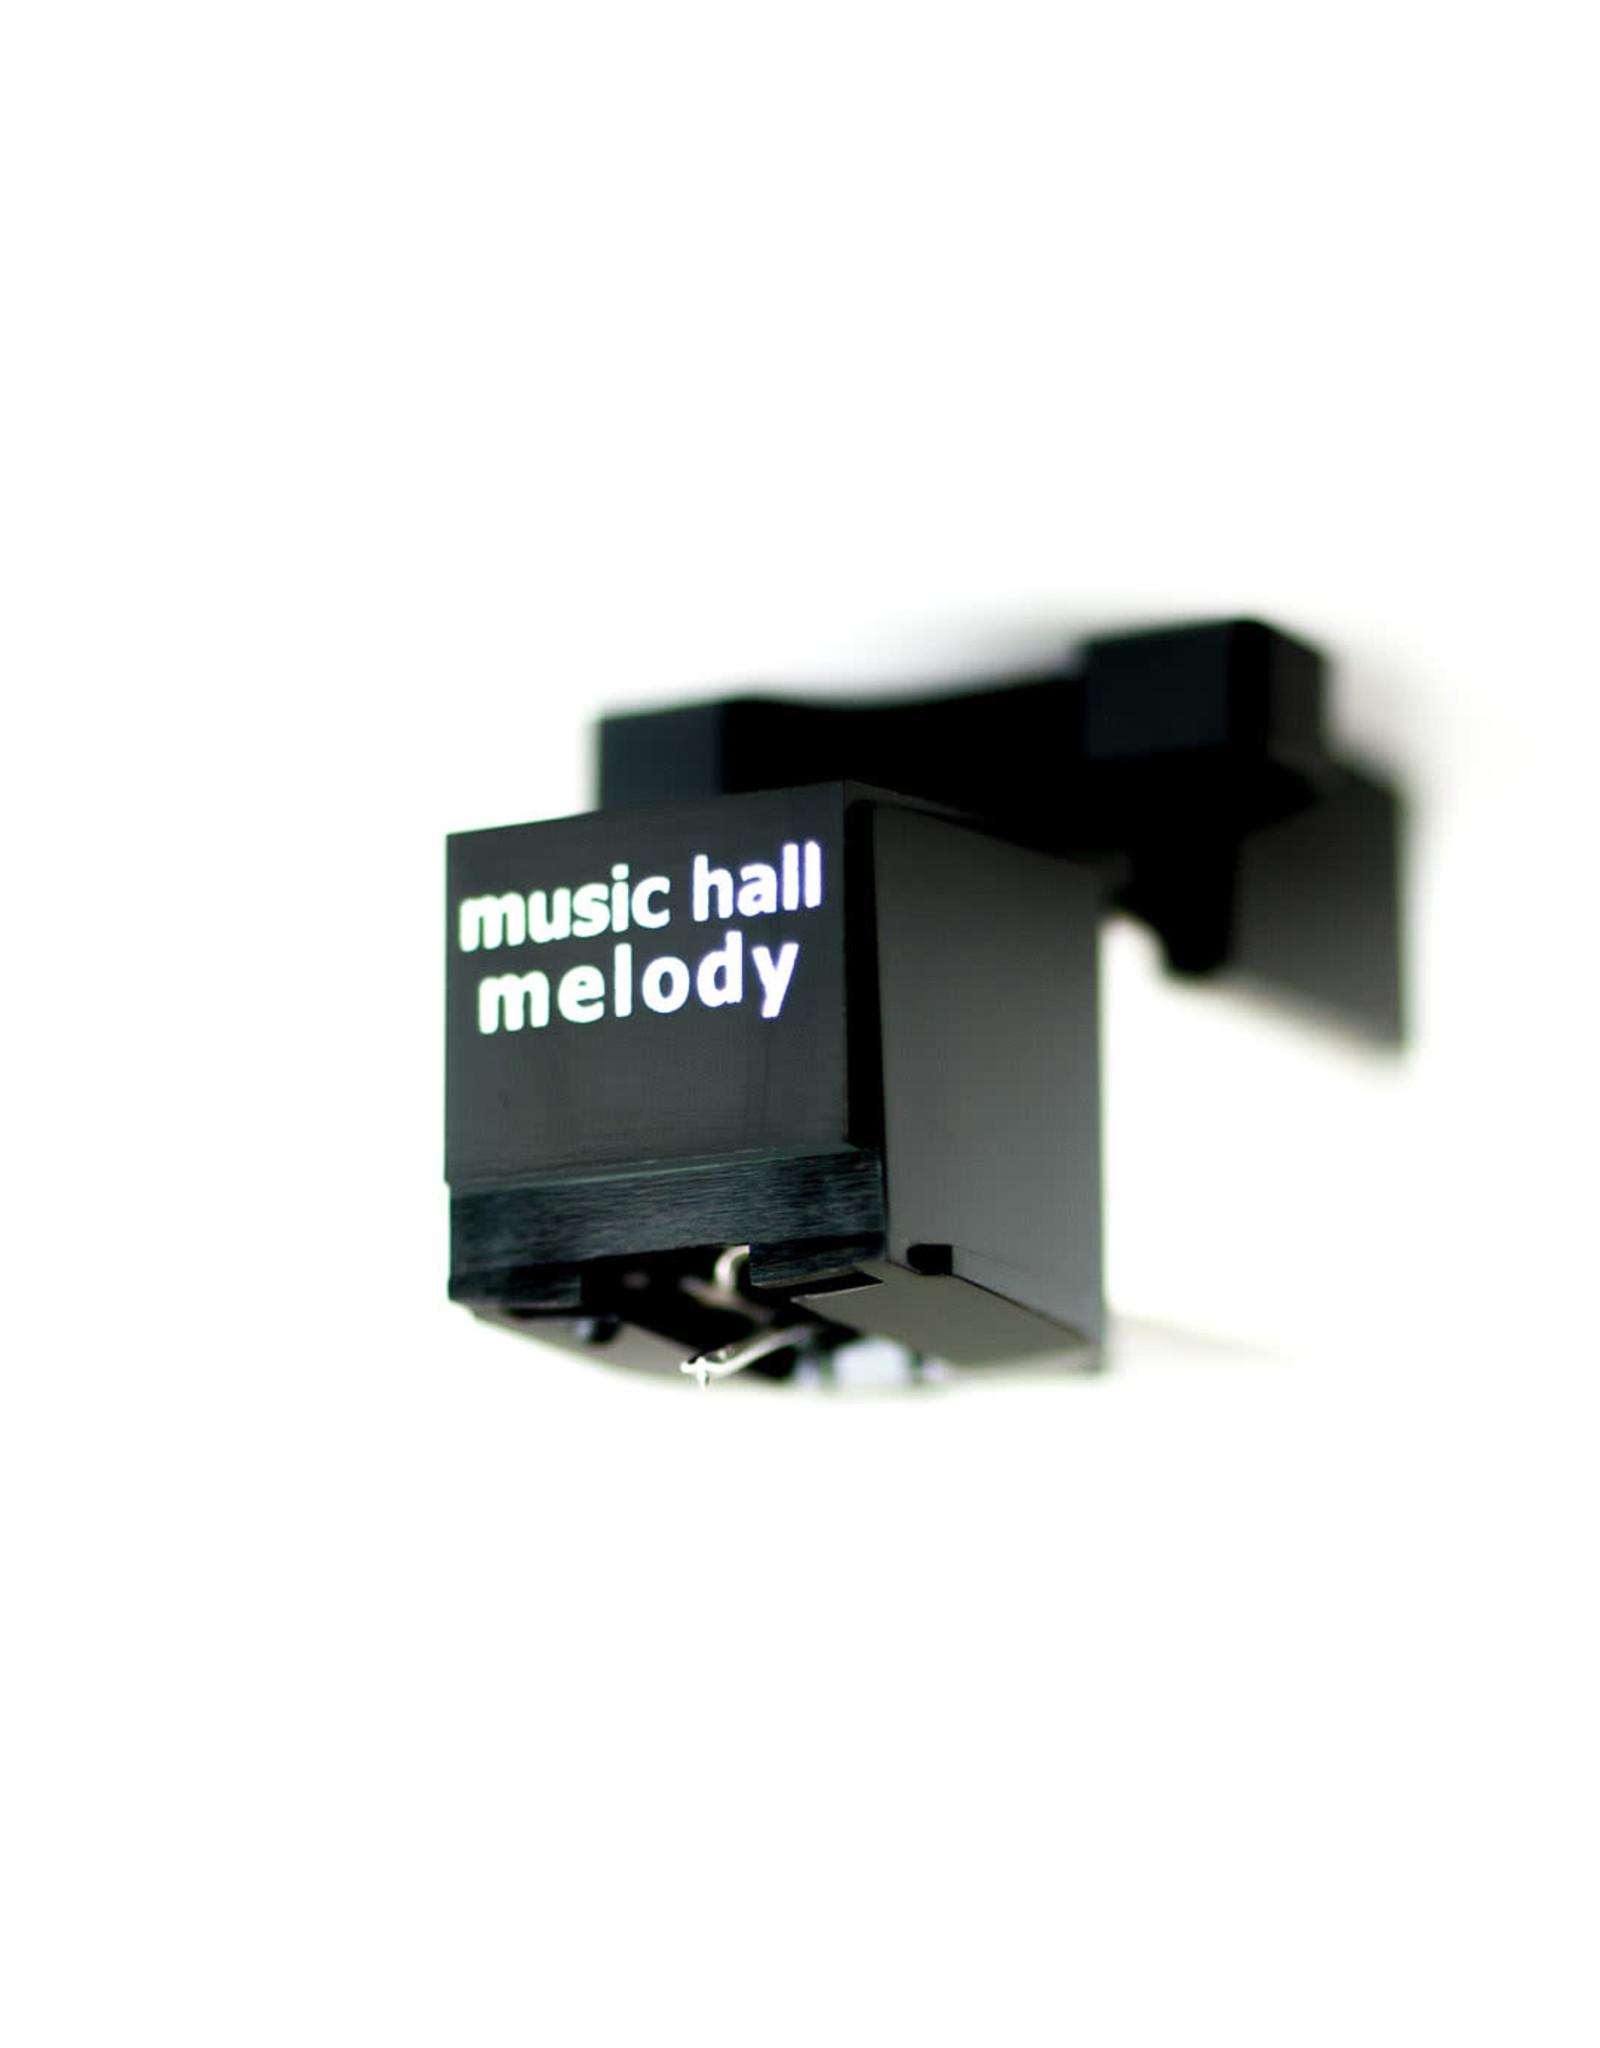 Music Hall Music Hall Melody Phono Stylus